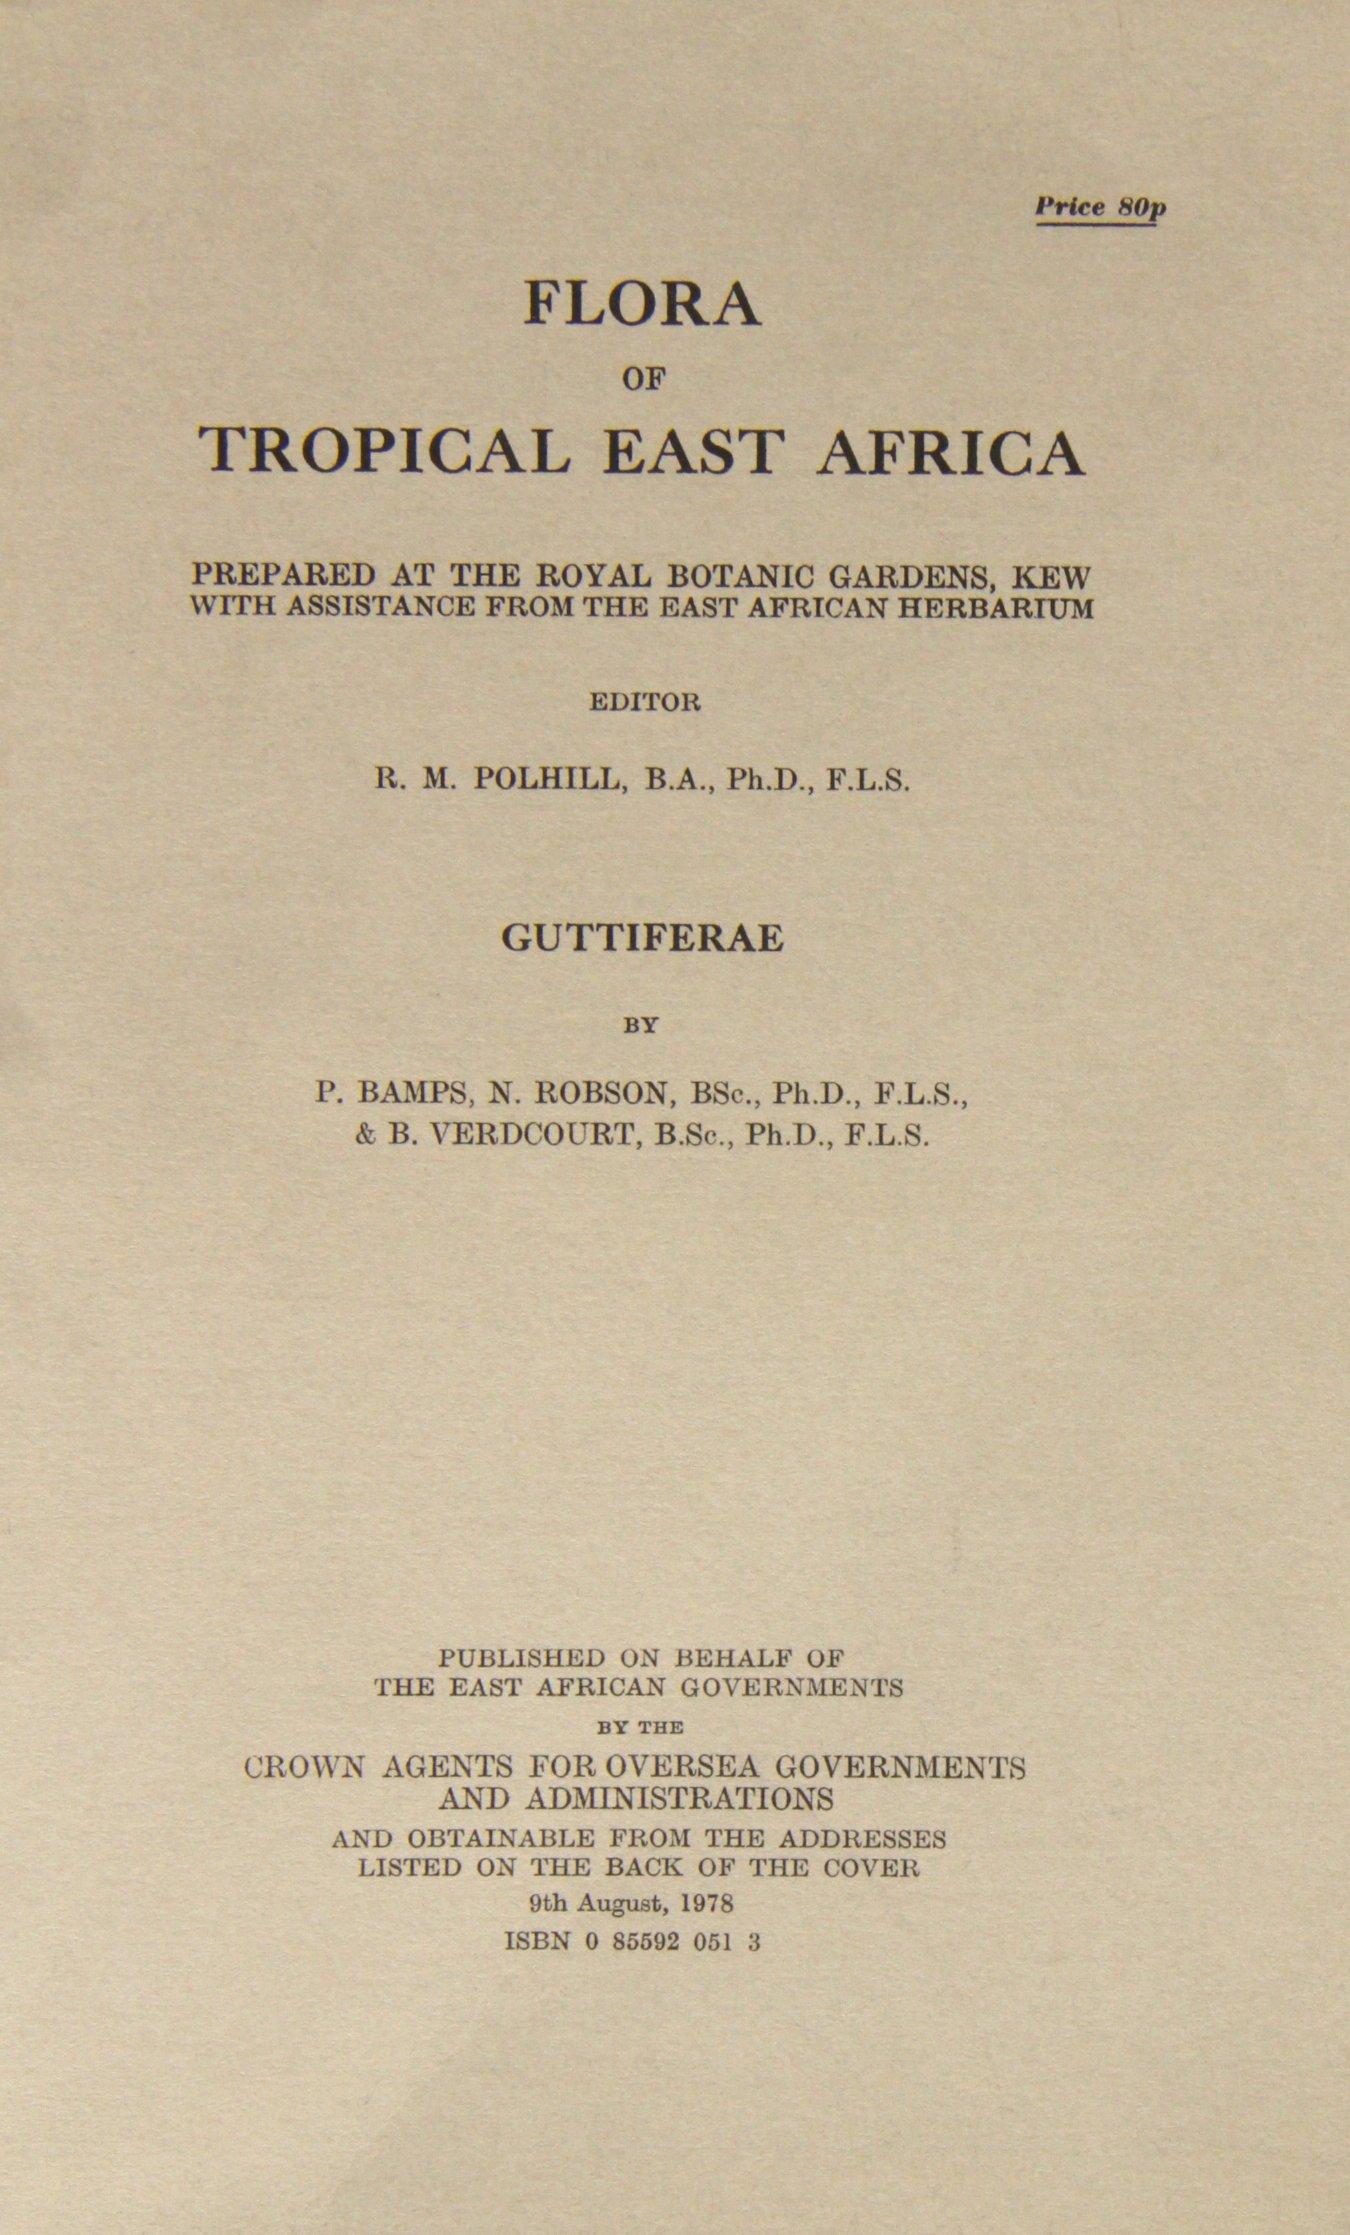 Download Flora of Tropical East Africa: Guttiferae pdf